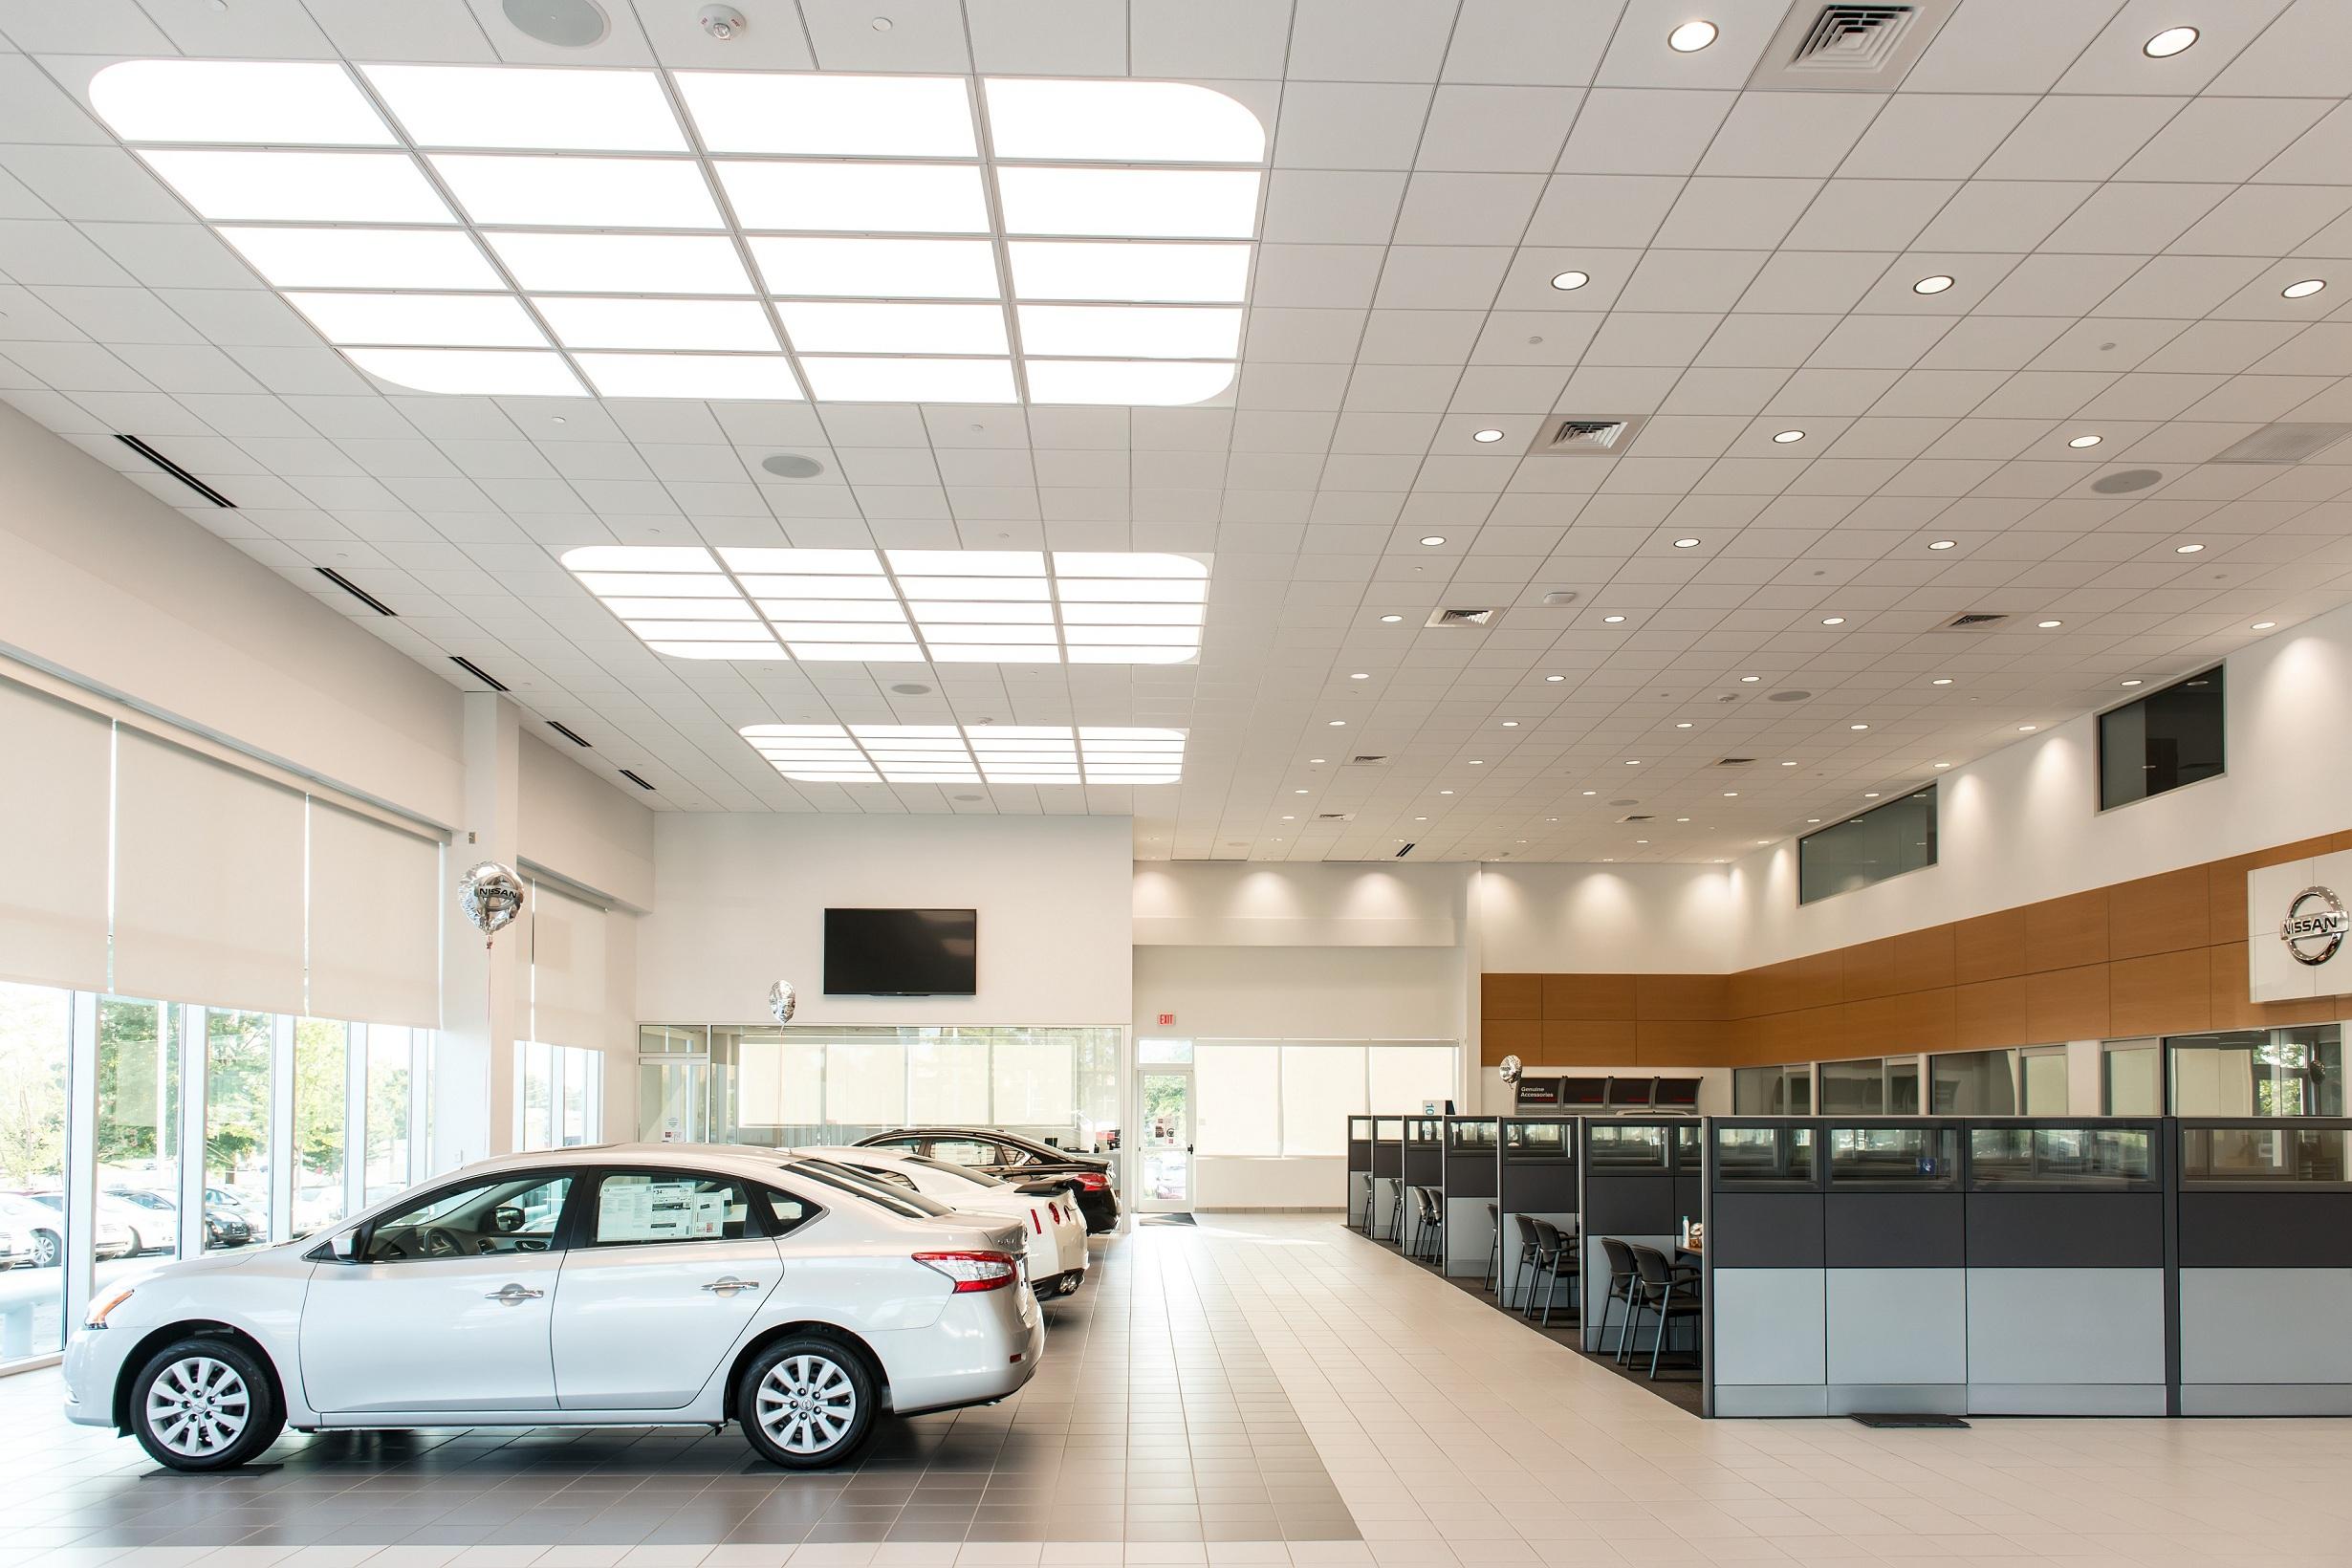 How To Design Car Dealership Interior Joy Studio Design